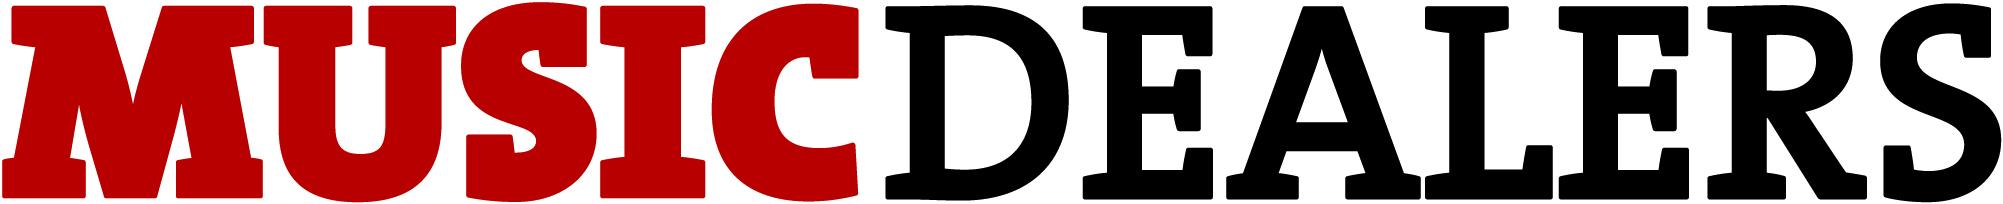 MusicDealers logo